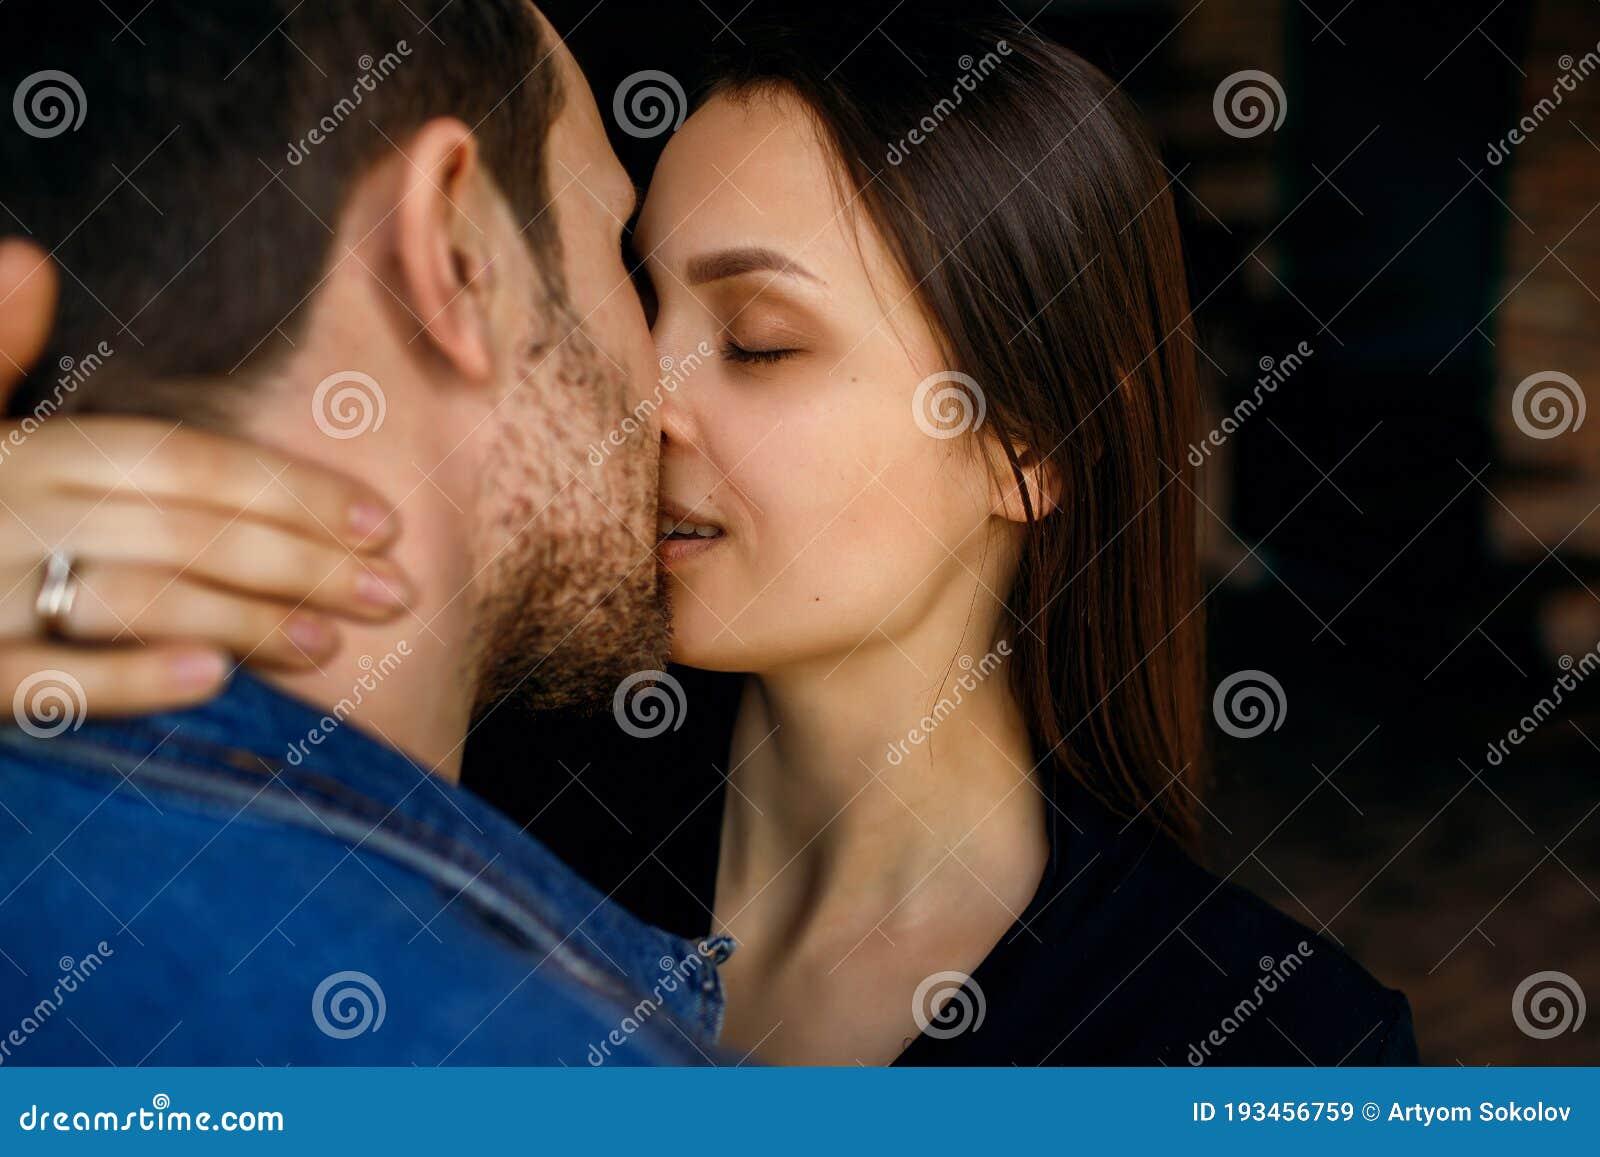 Woman body kiss woman Category:Females kissing